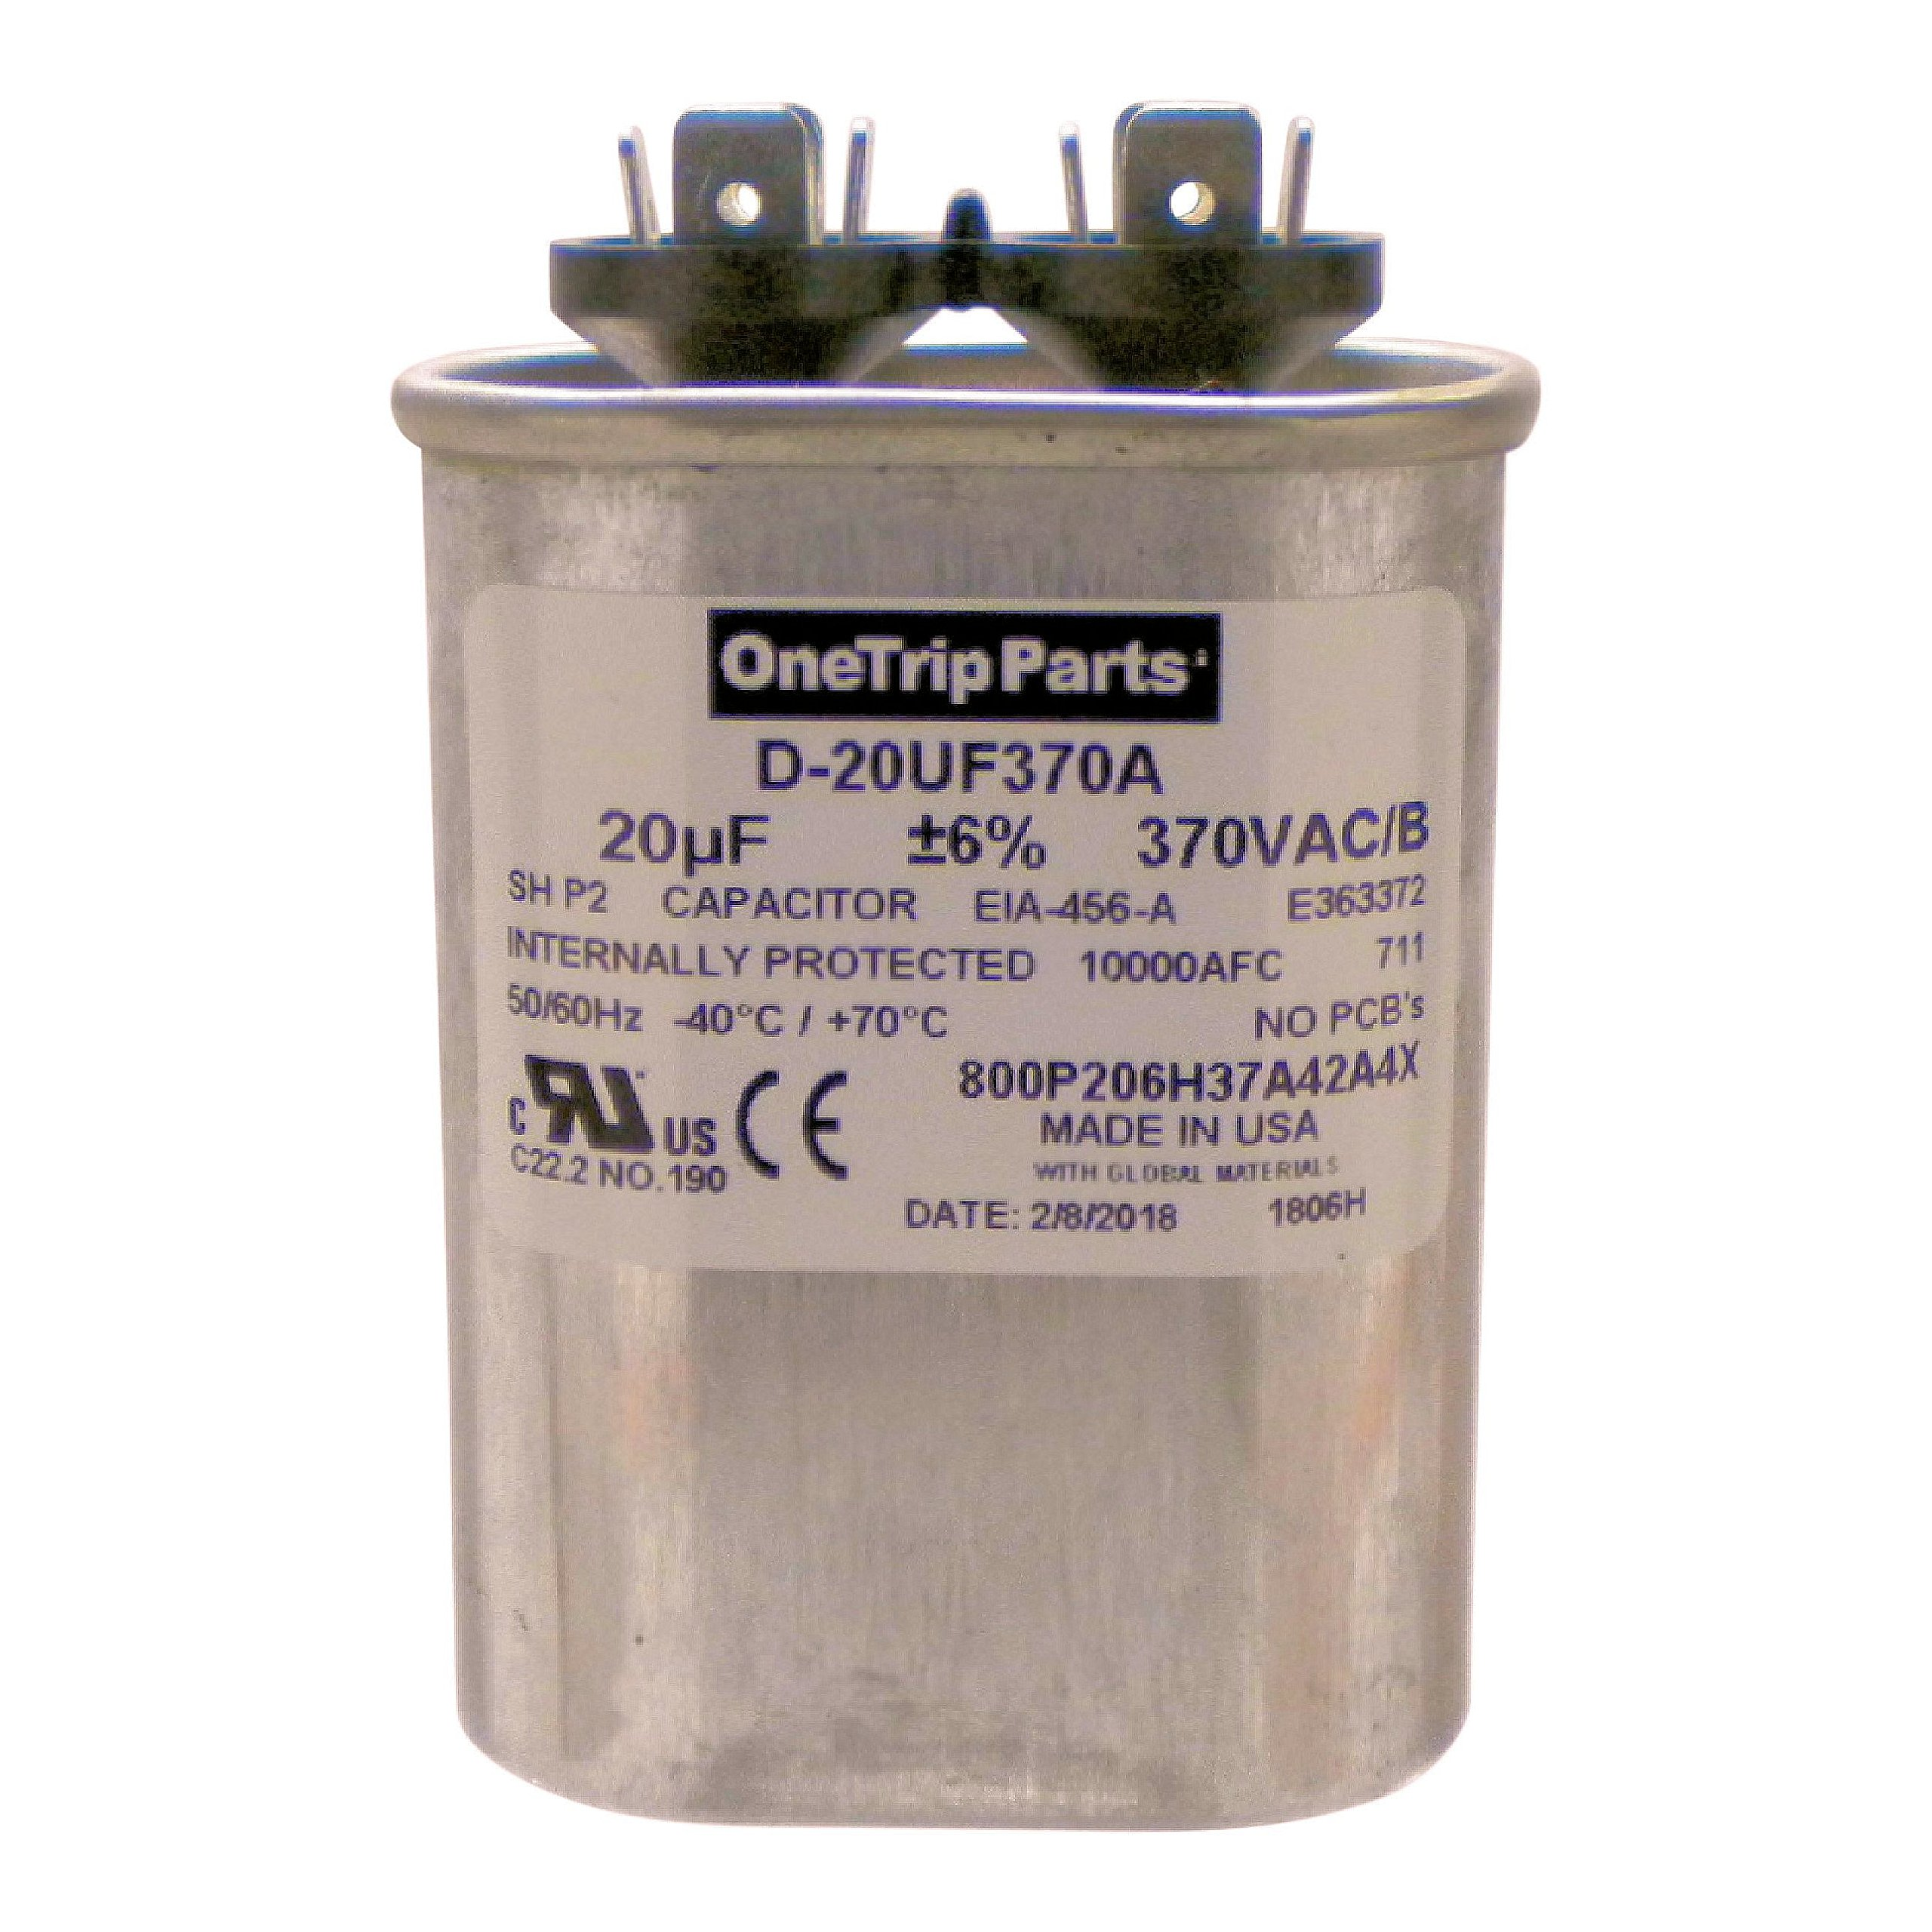 OneTrip Parts USA Run Capacitor 20 UF - 20 MFD 370 VAC Flat Oval